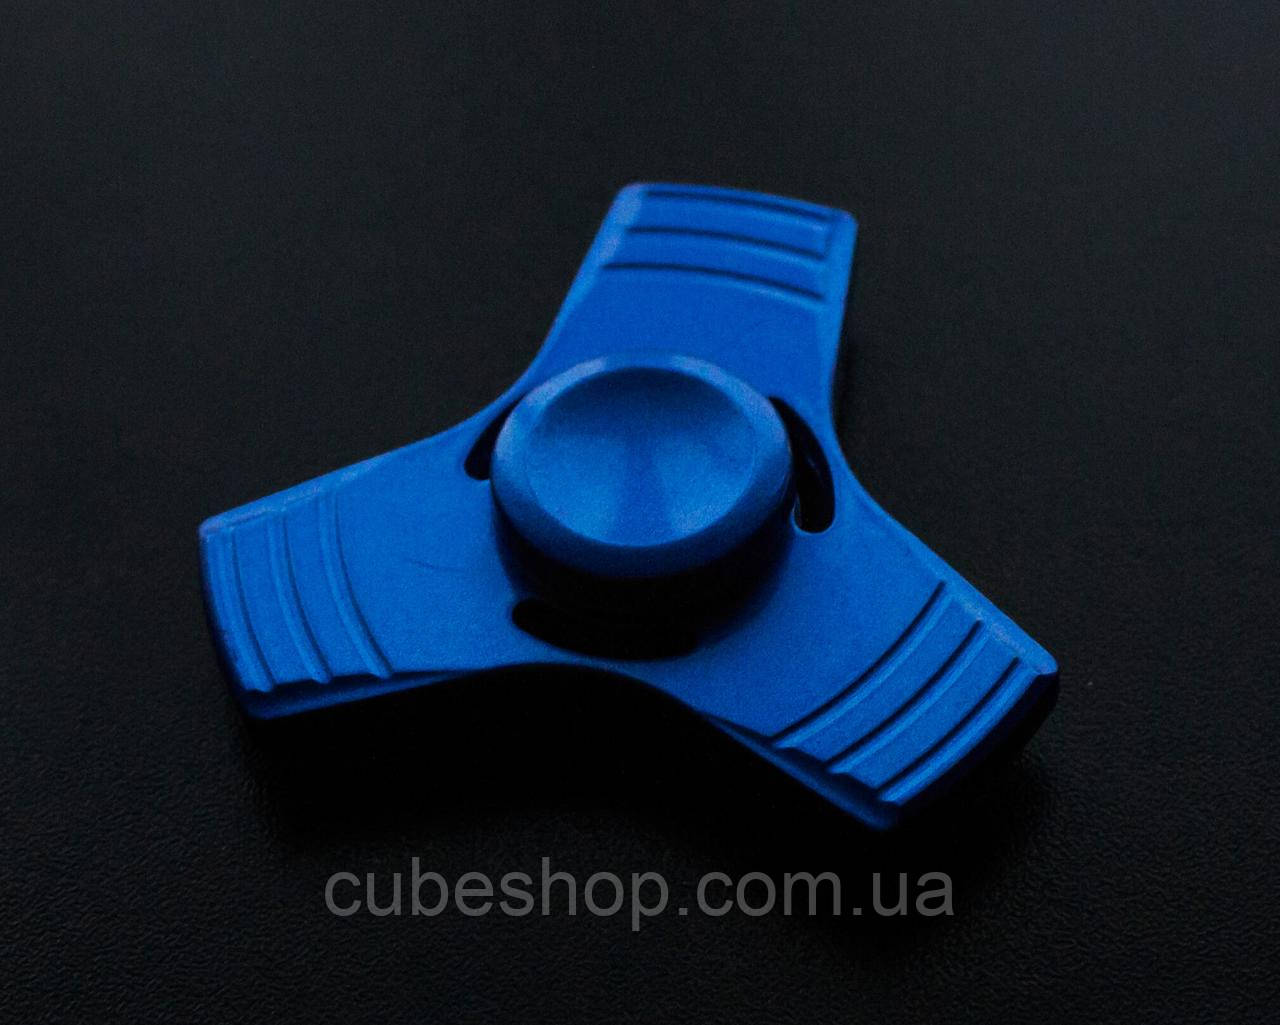 Y-cпиннер металлический Синий